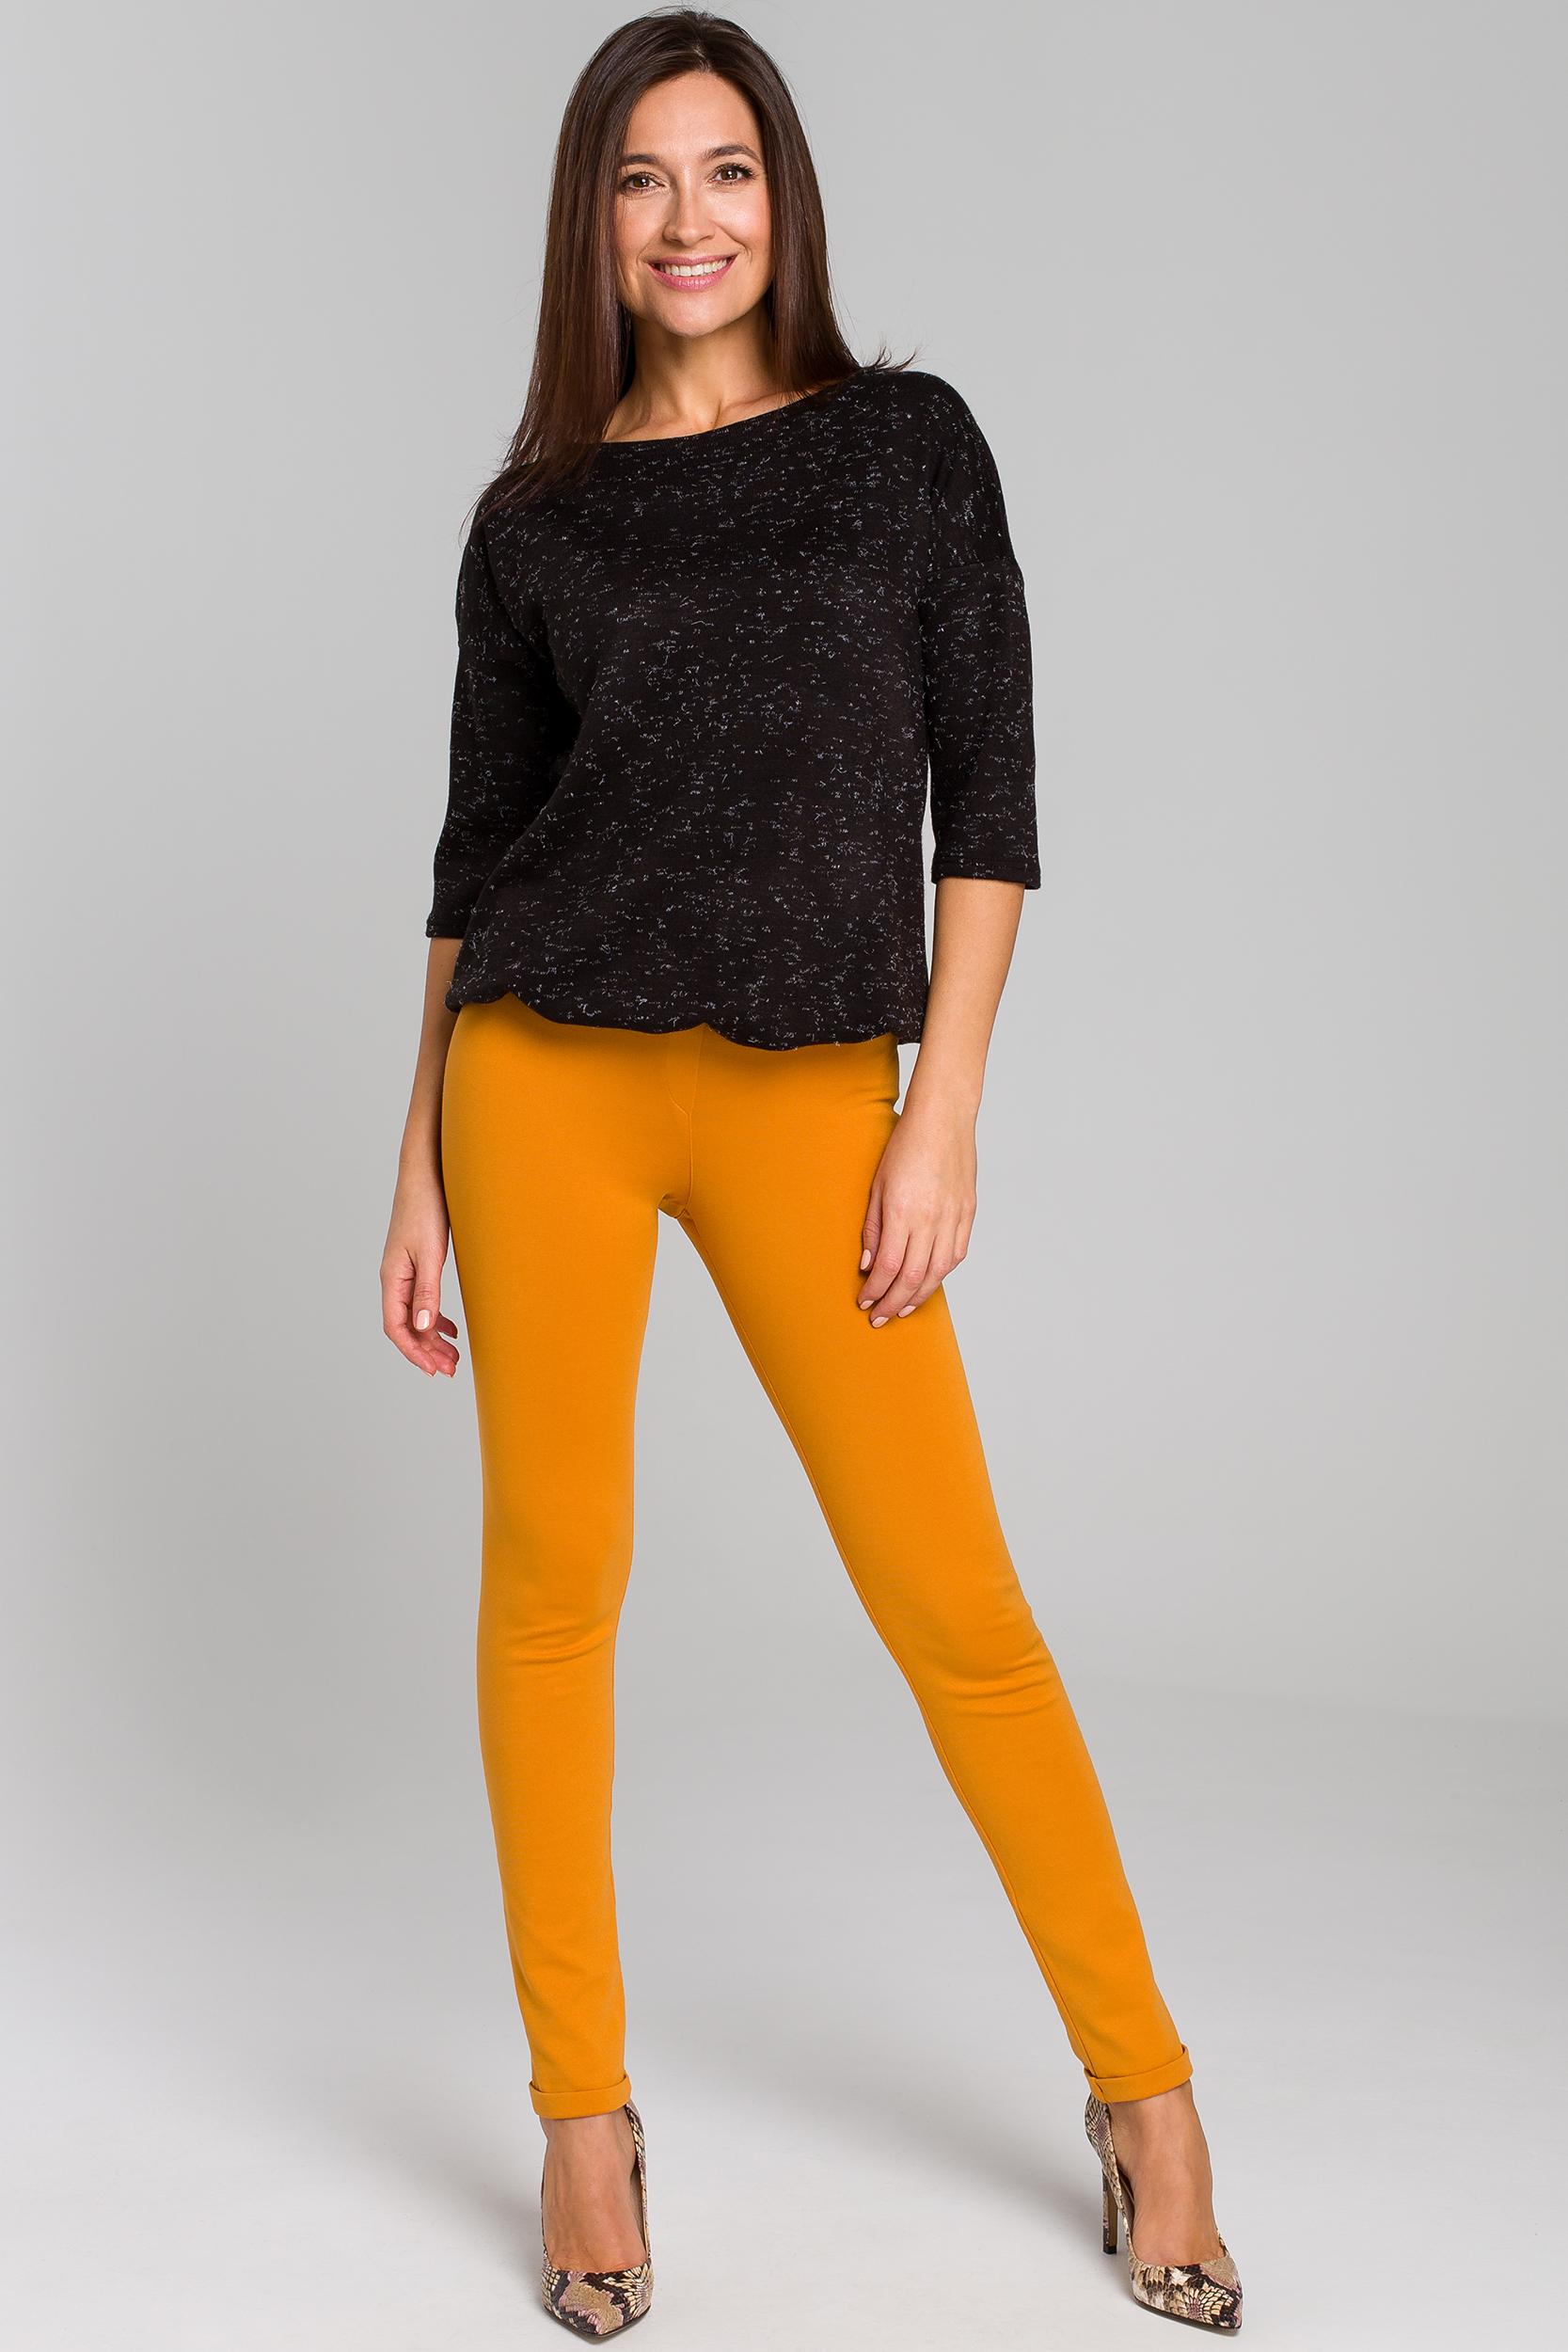 CM4143 Proste spodnie typu rurki - żółte